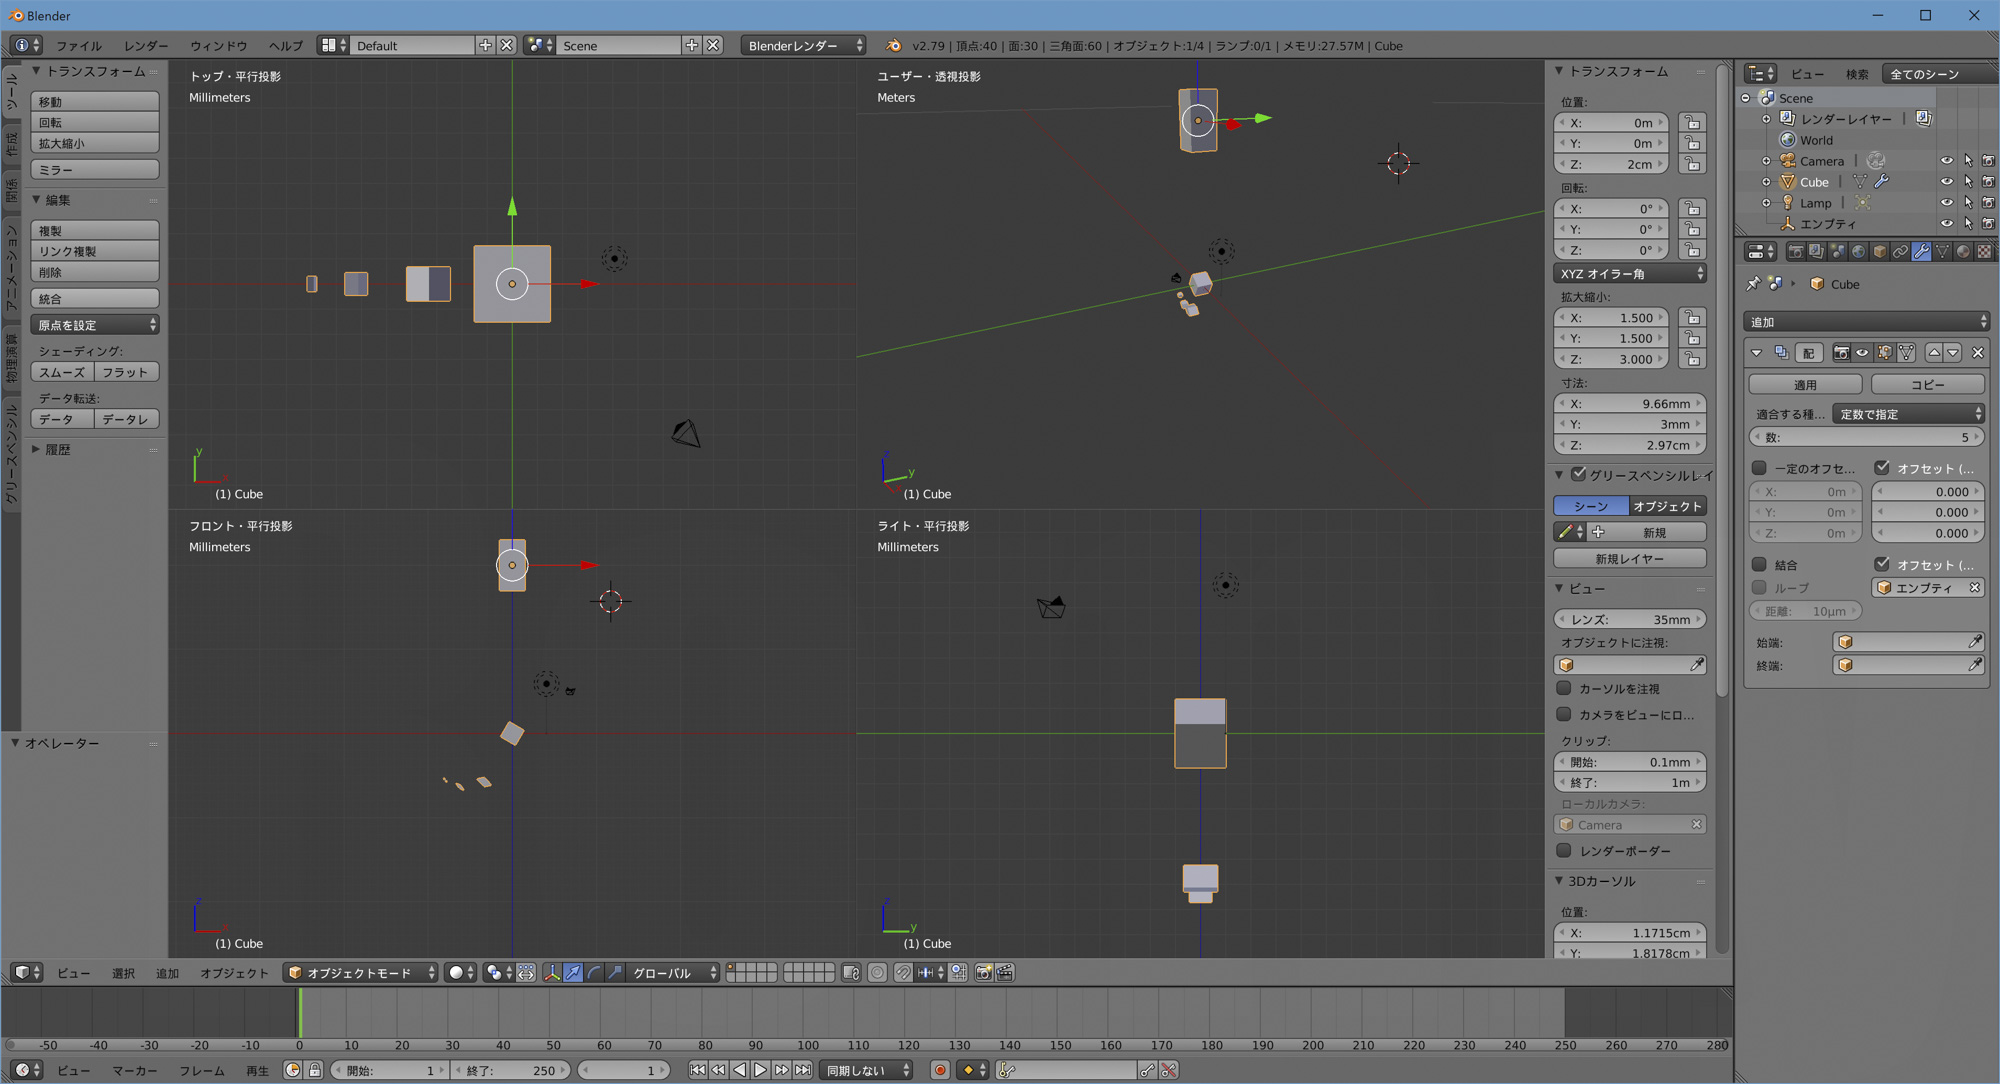 Blender: 配列複製失敗